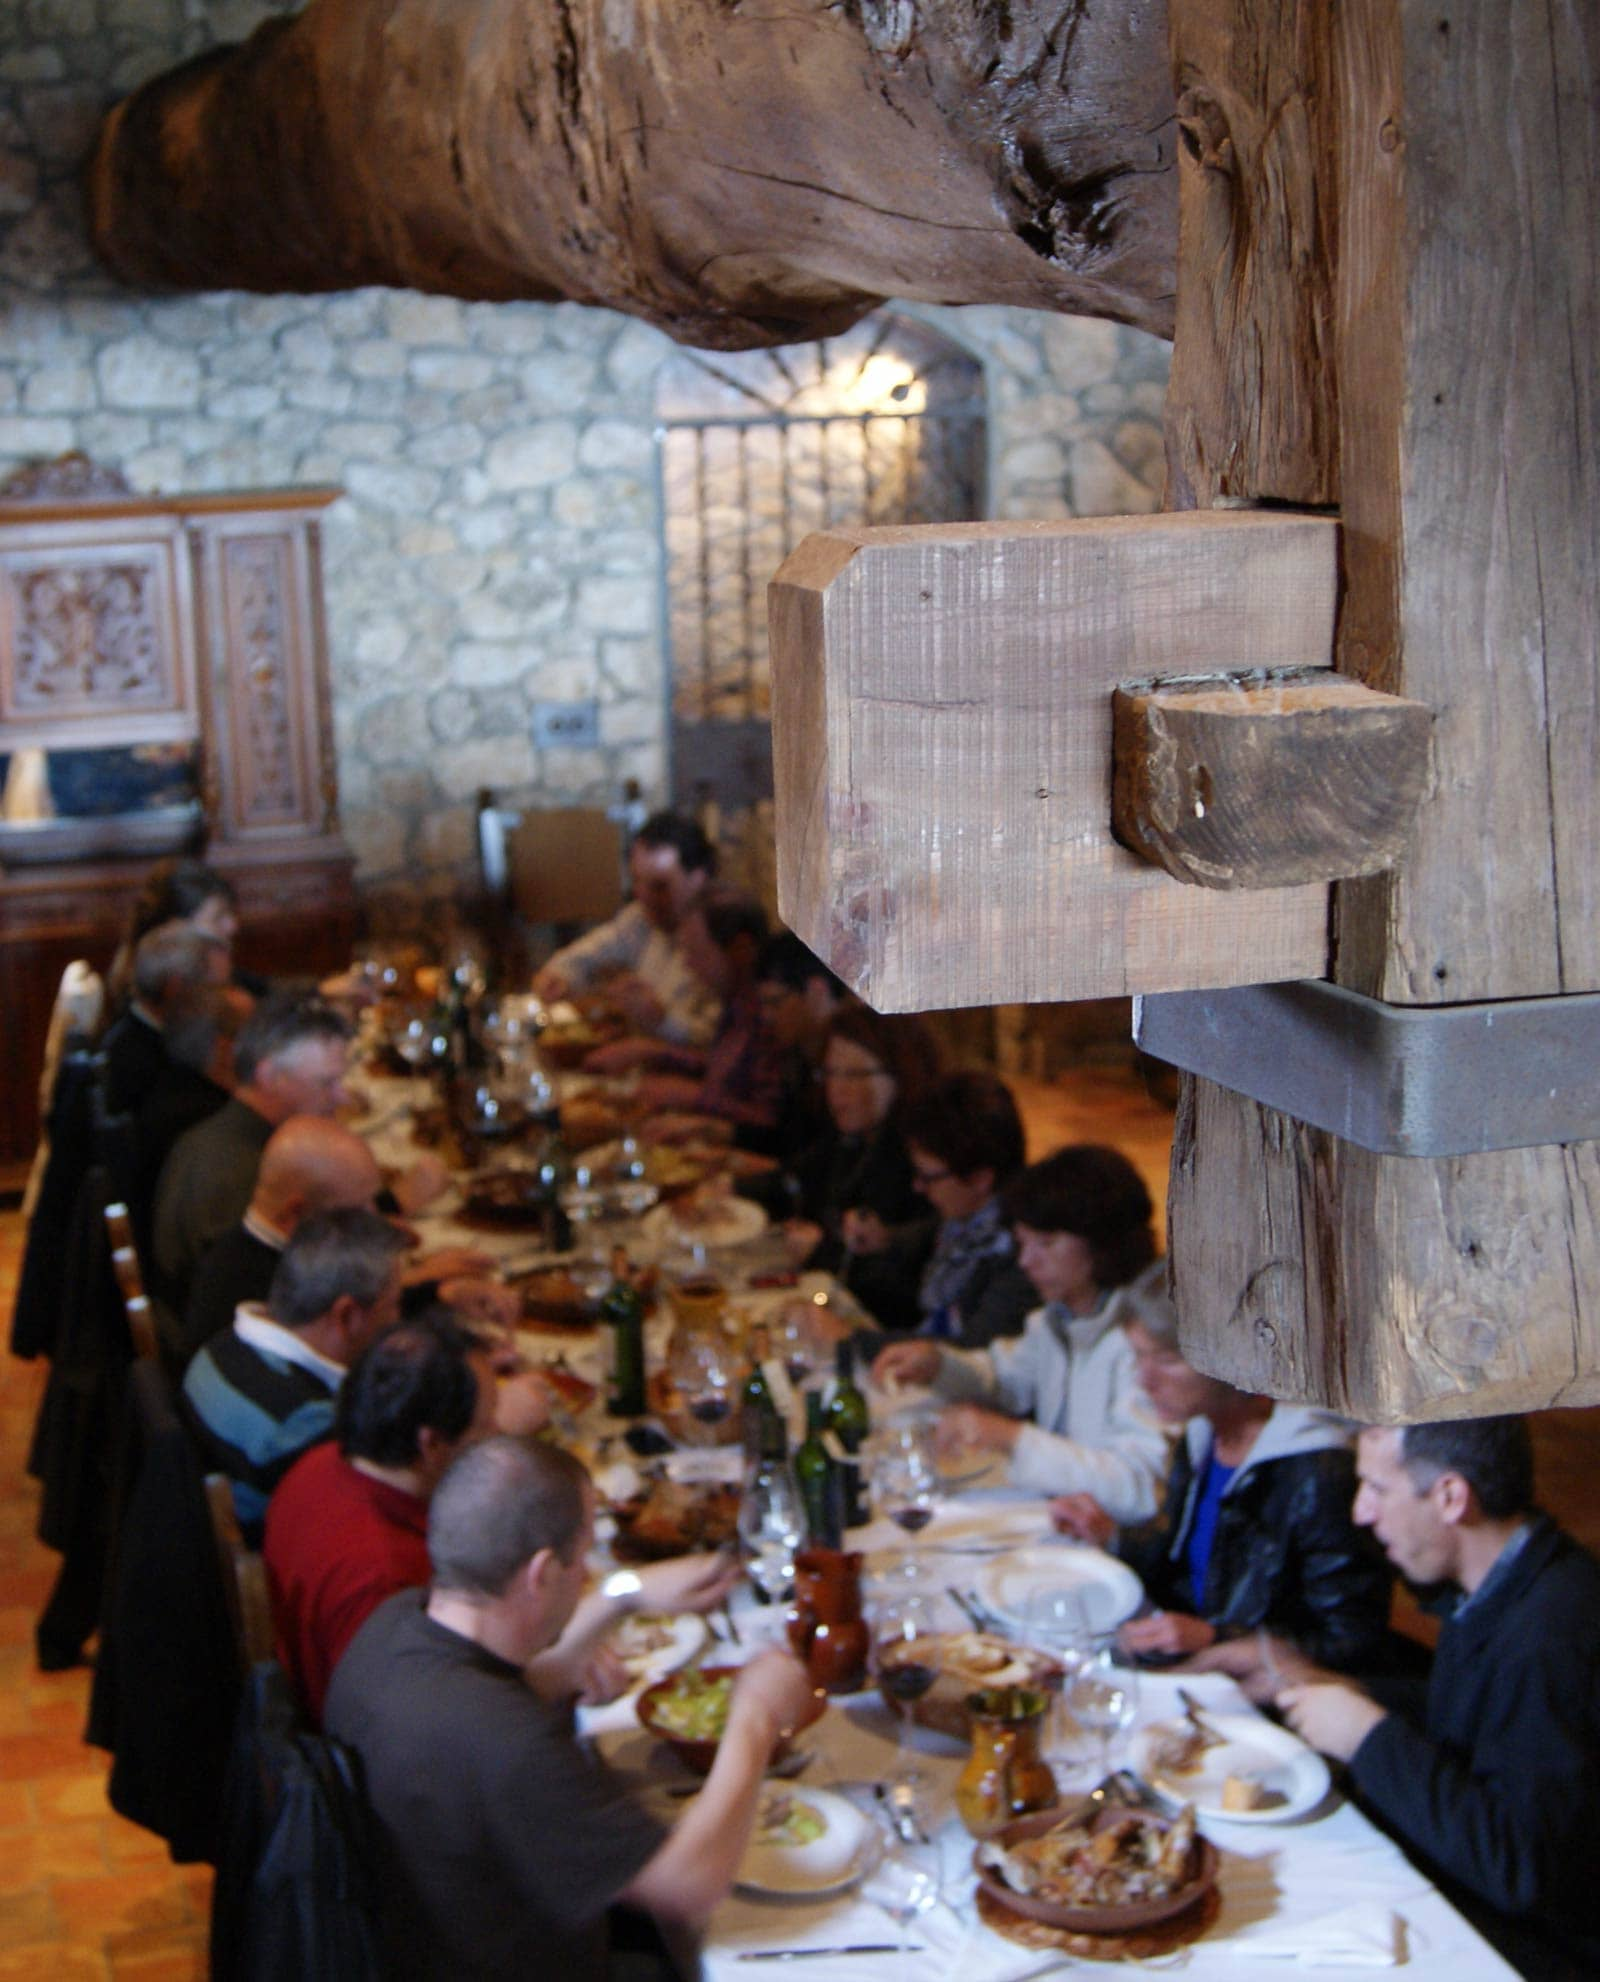 Gente comiendo lechazo de las Bodegas Valduero en la Ribera del Duero